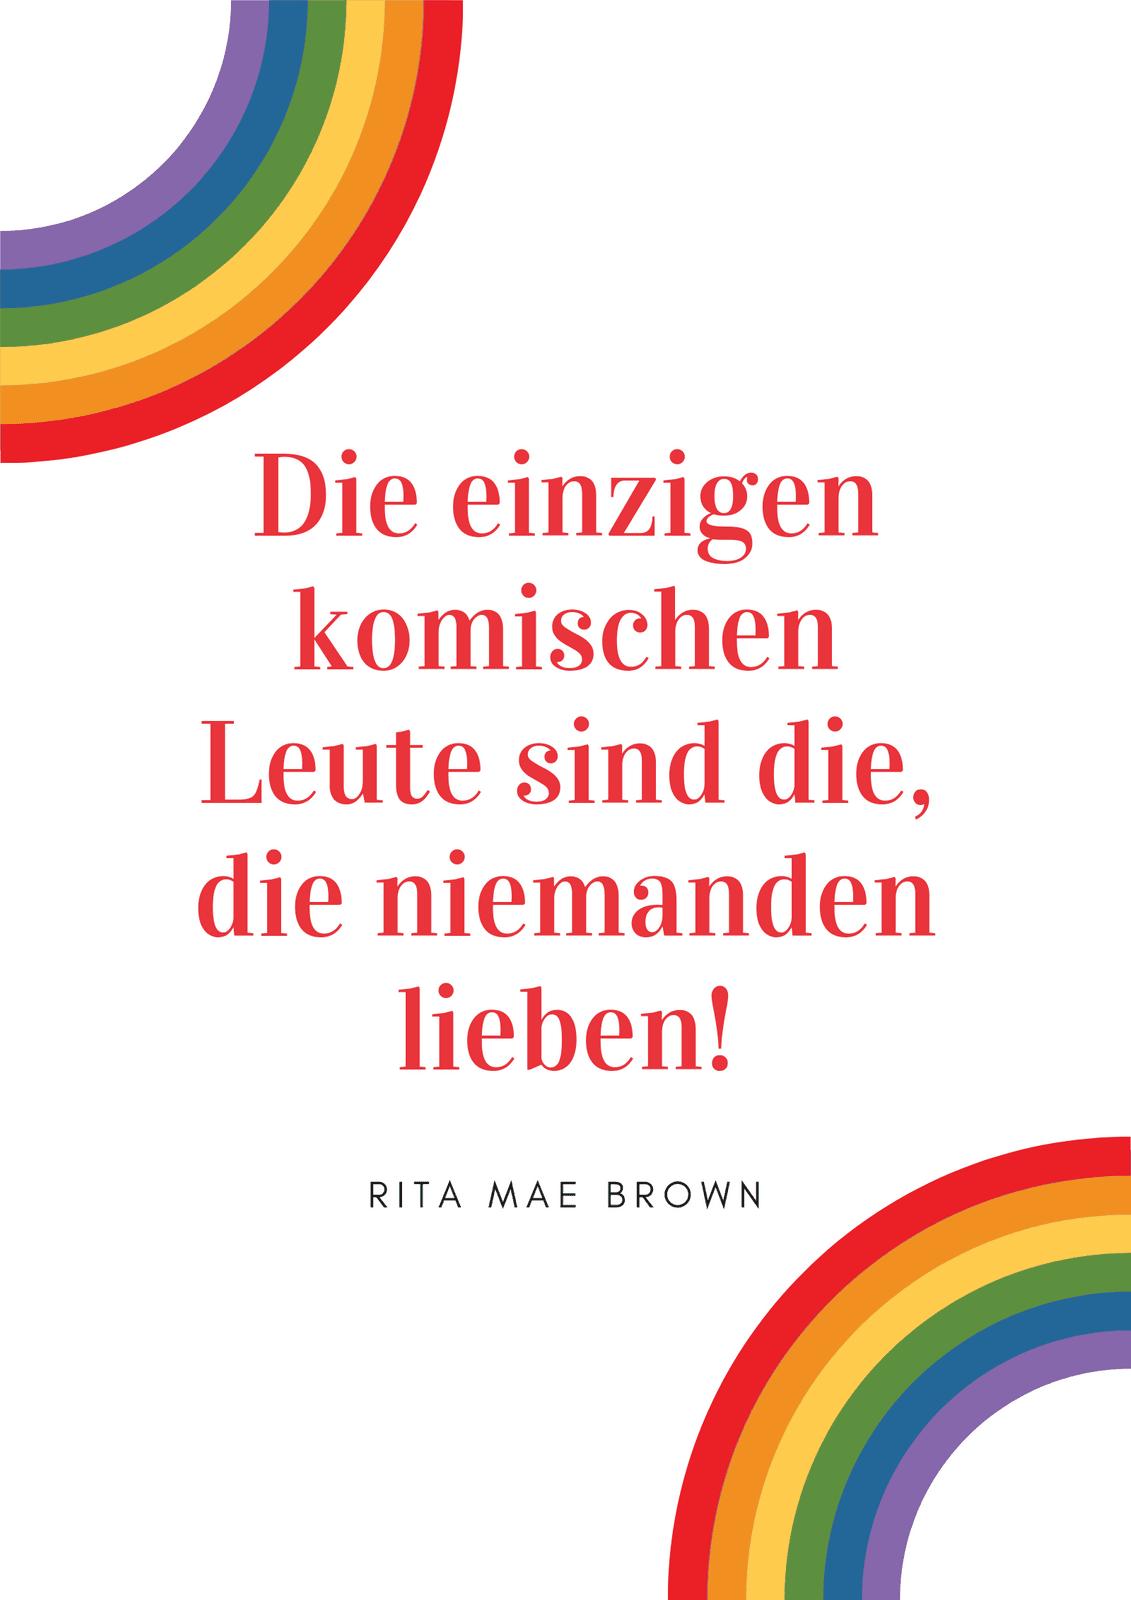 Einfach Regenbogen Flagge schwul Rechte Poster